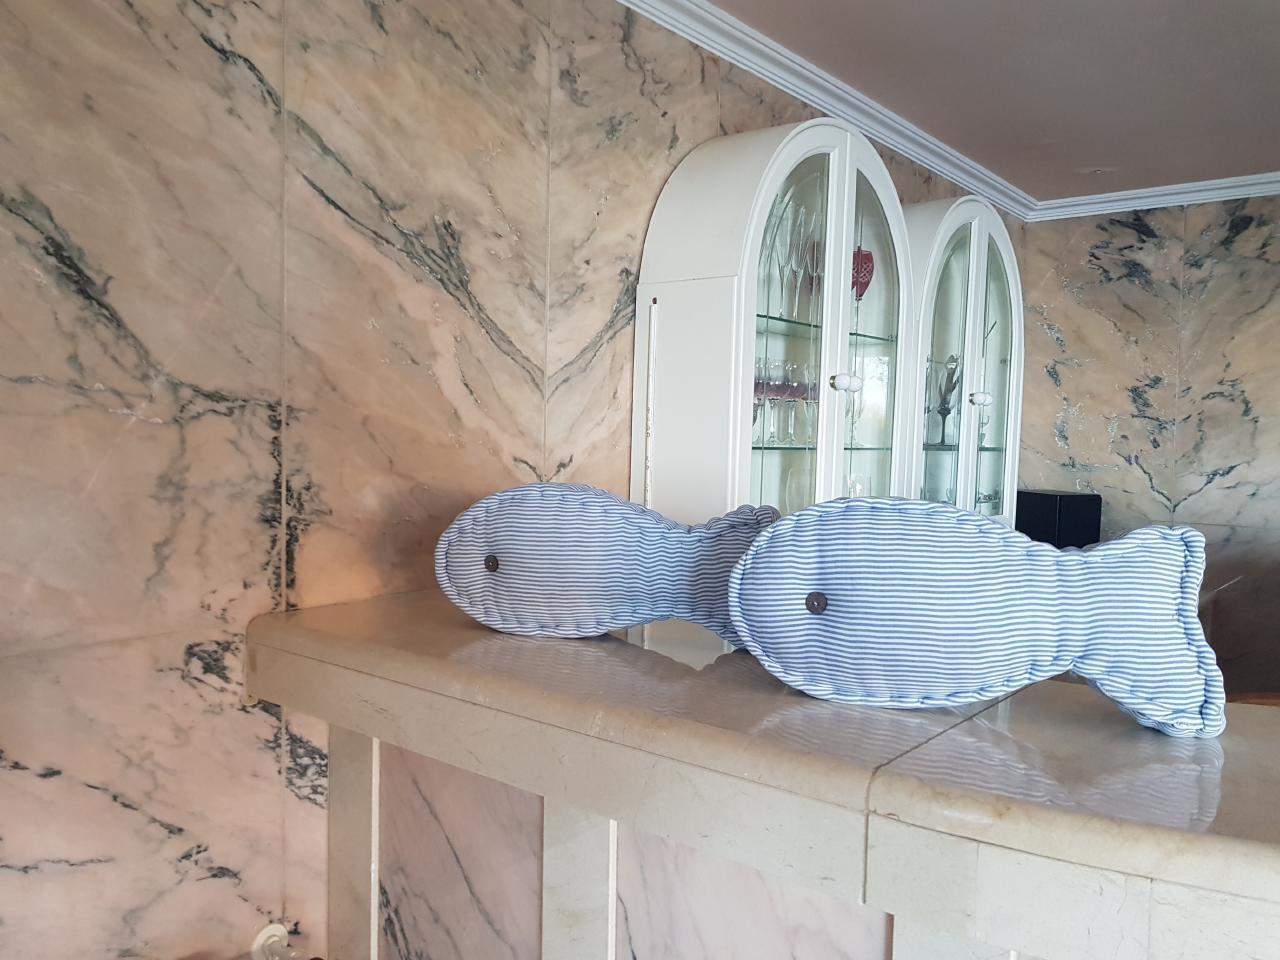 Appartement de vacances Villa Larnia Familien Apartment   * Urlaub für Körper, Geist und Seele * (2529406), El Sauzal, Ténérife, Iles Canaries, Espagne, image 10